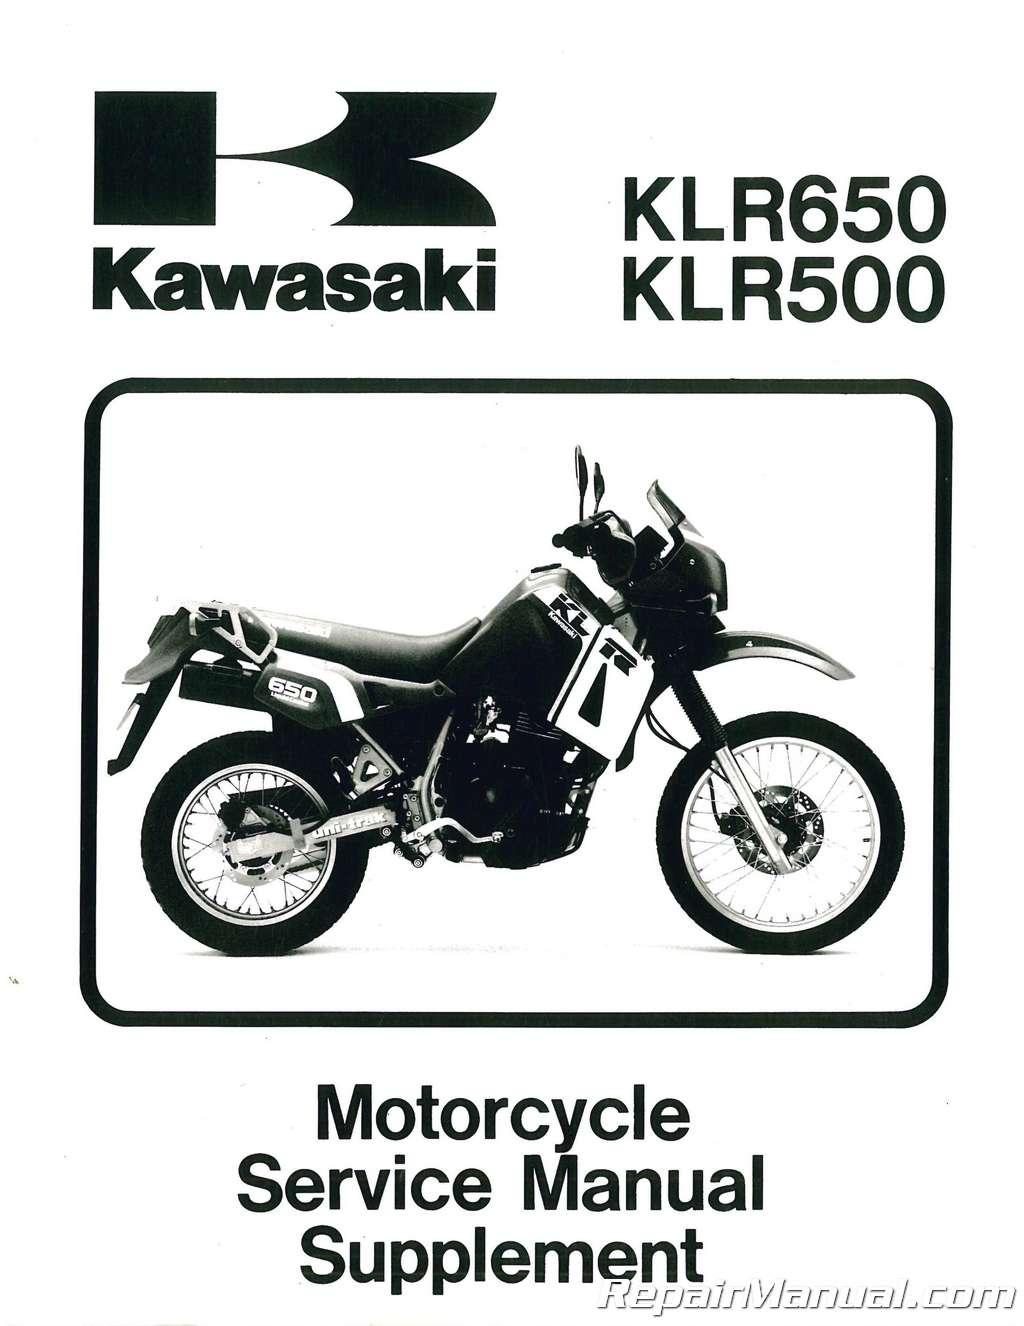 2004 klr 650 service manual